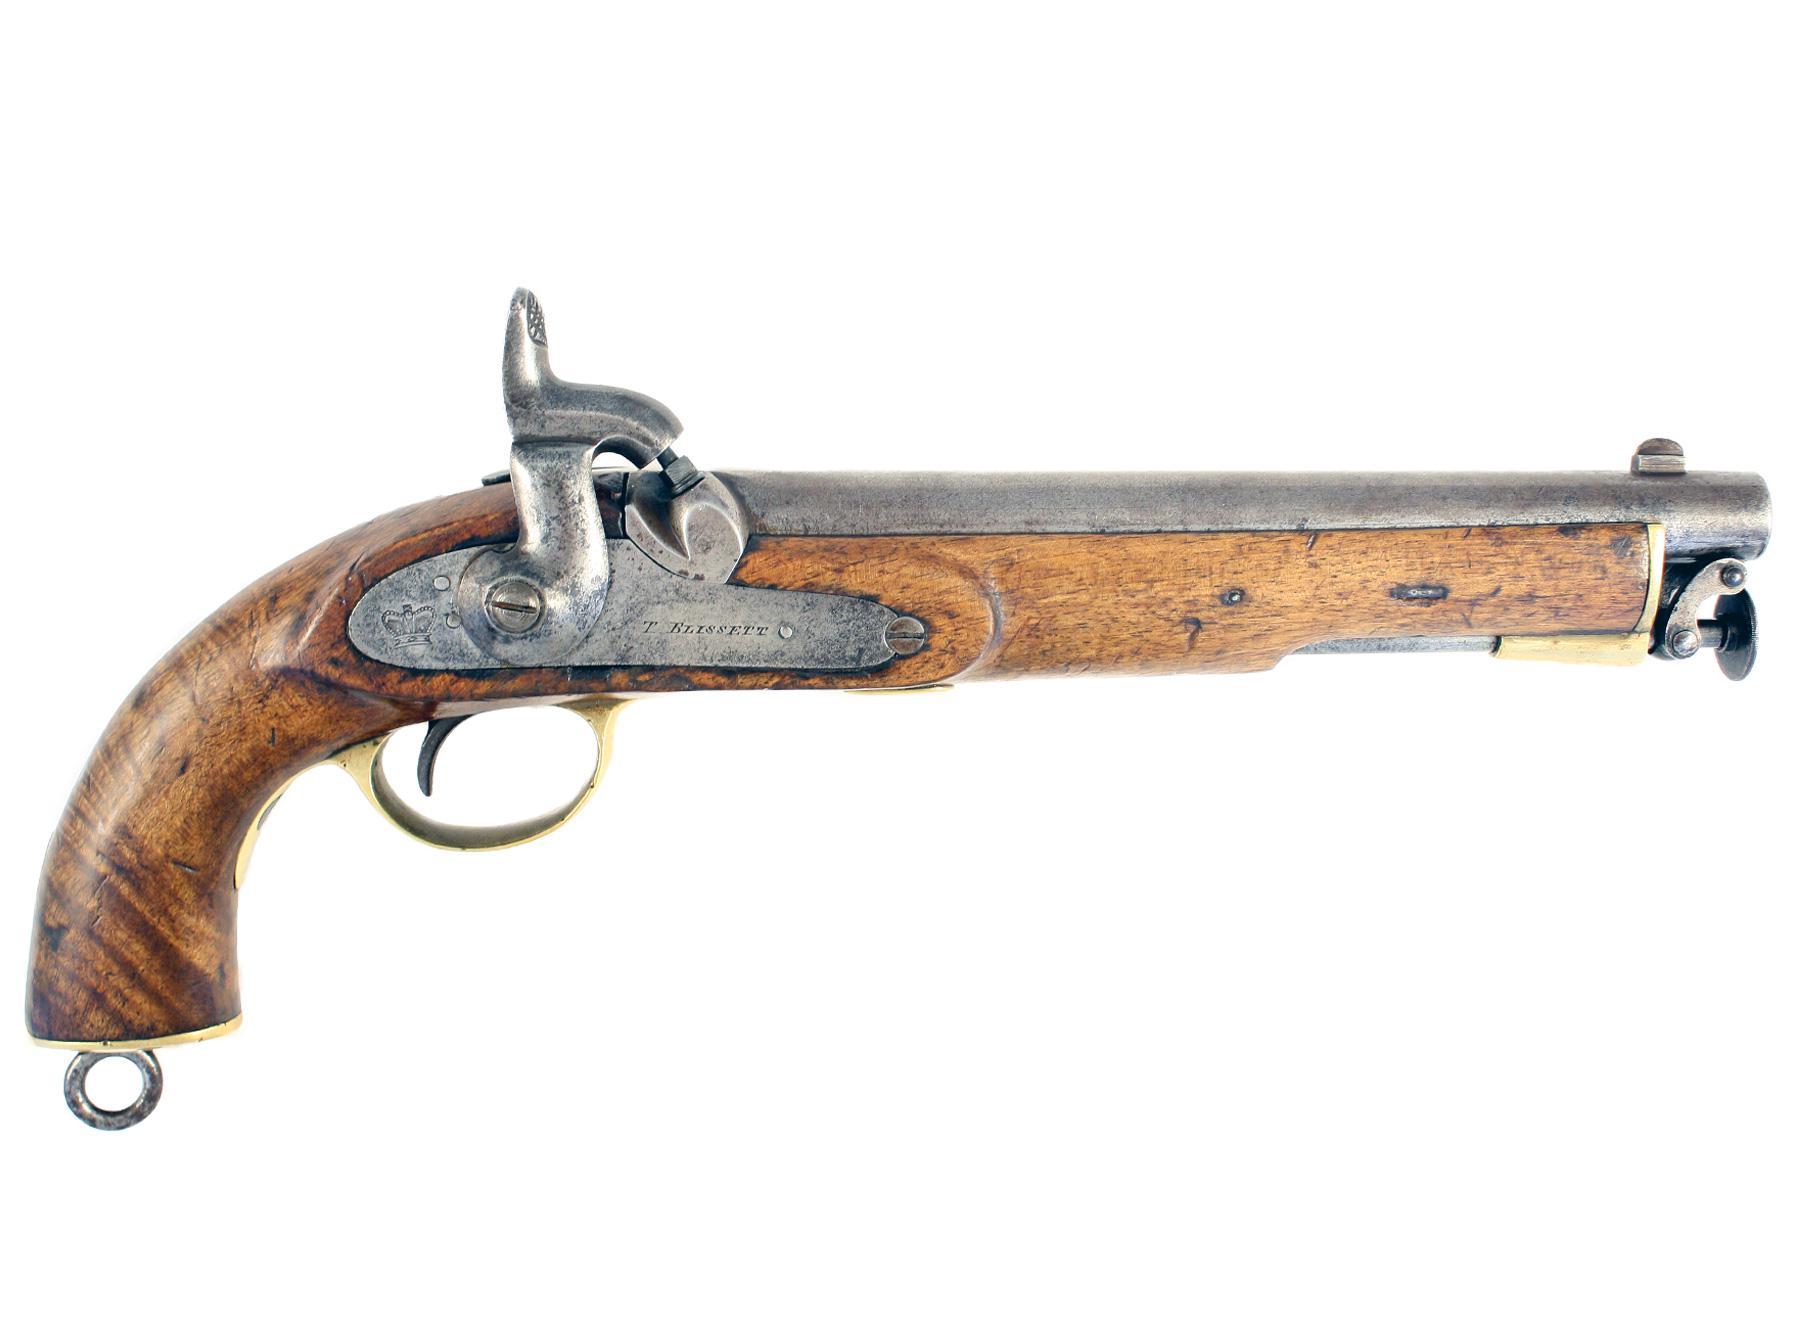 A Rifled Lancer Pistol